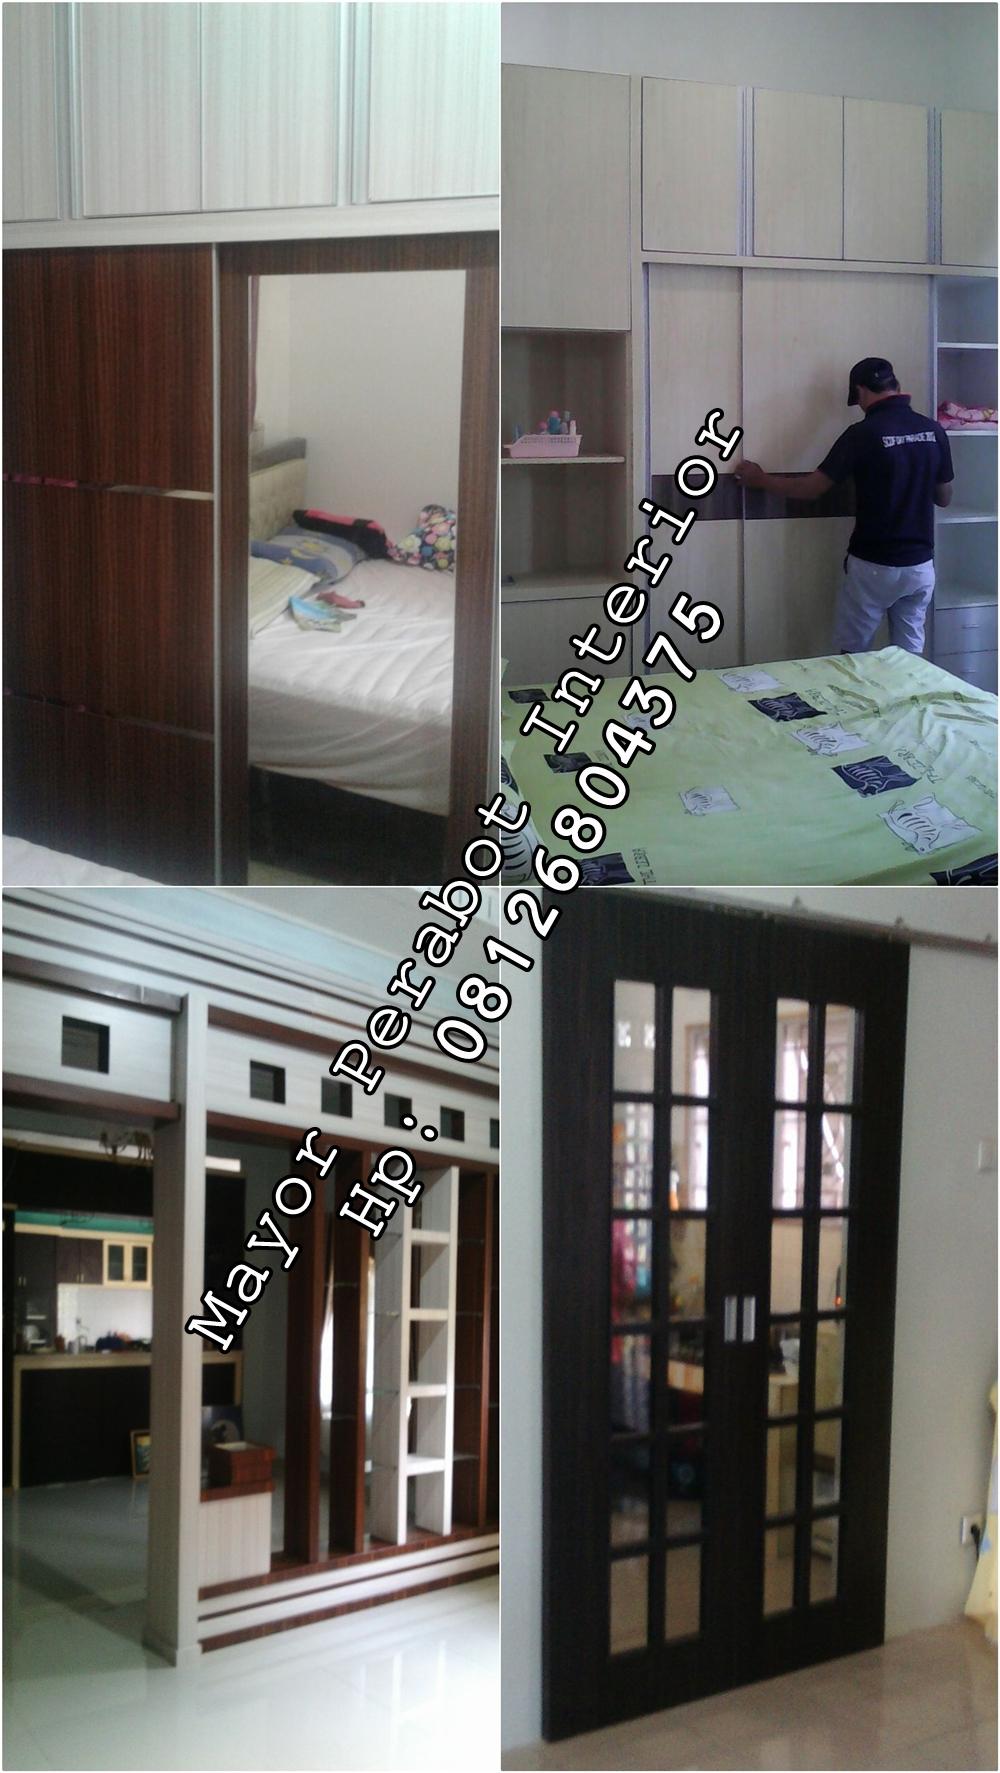 Mayor Perabot Interior 5 - Mayor Perabot Interior | Perabot Interior Pekanbaru